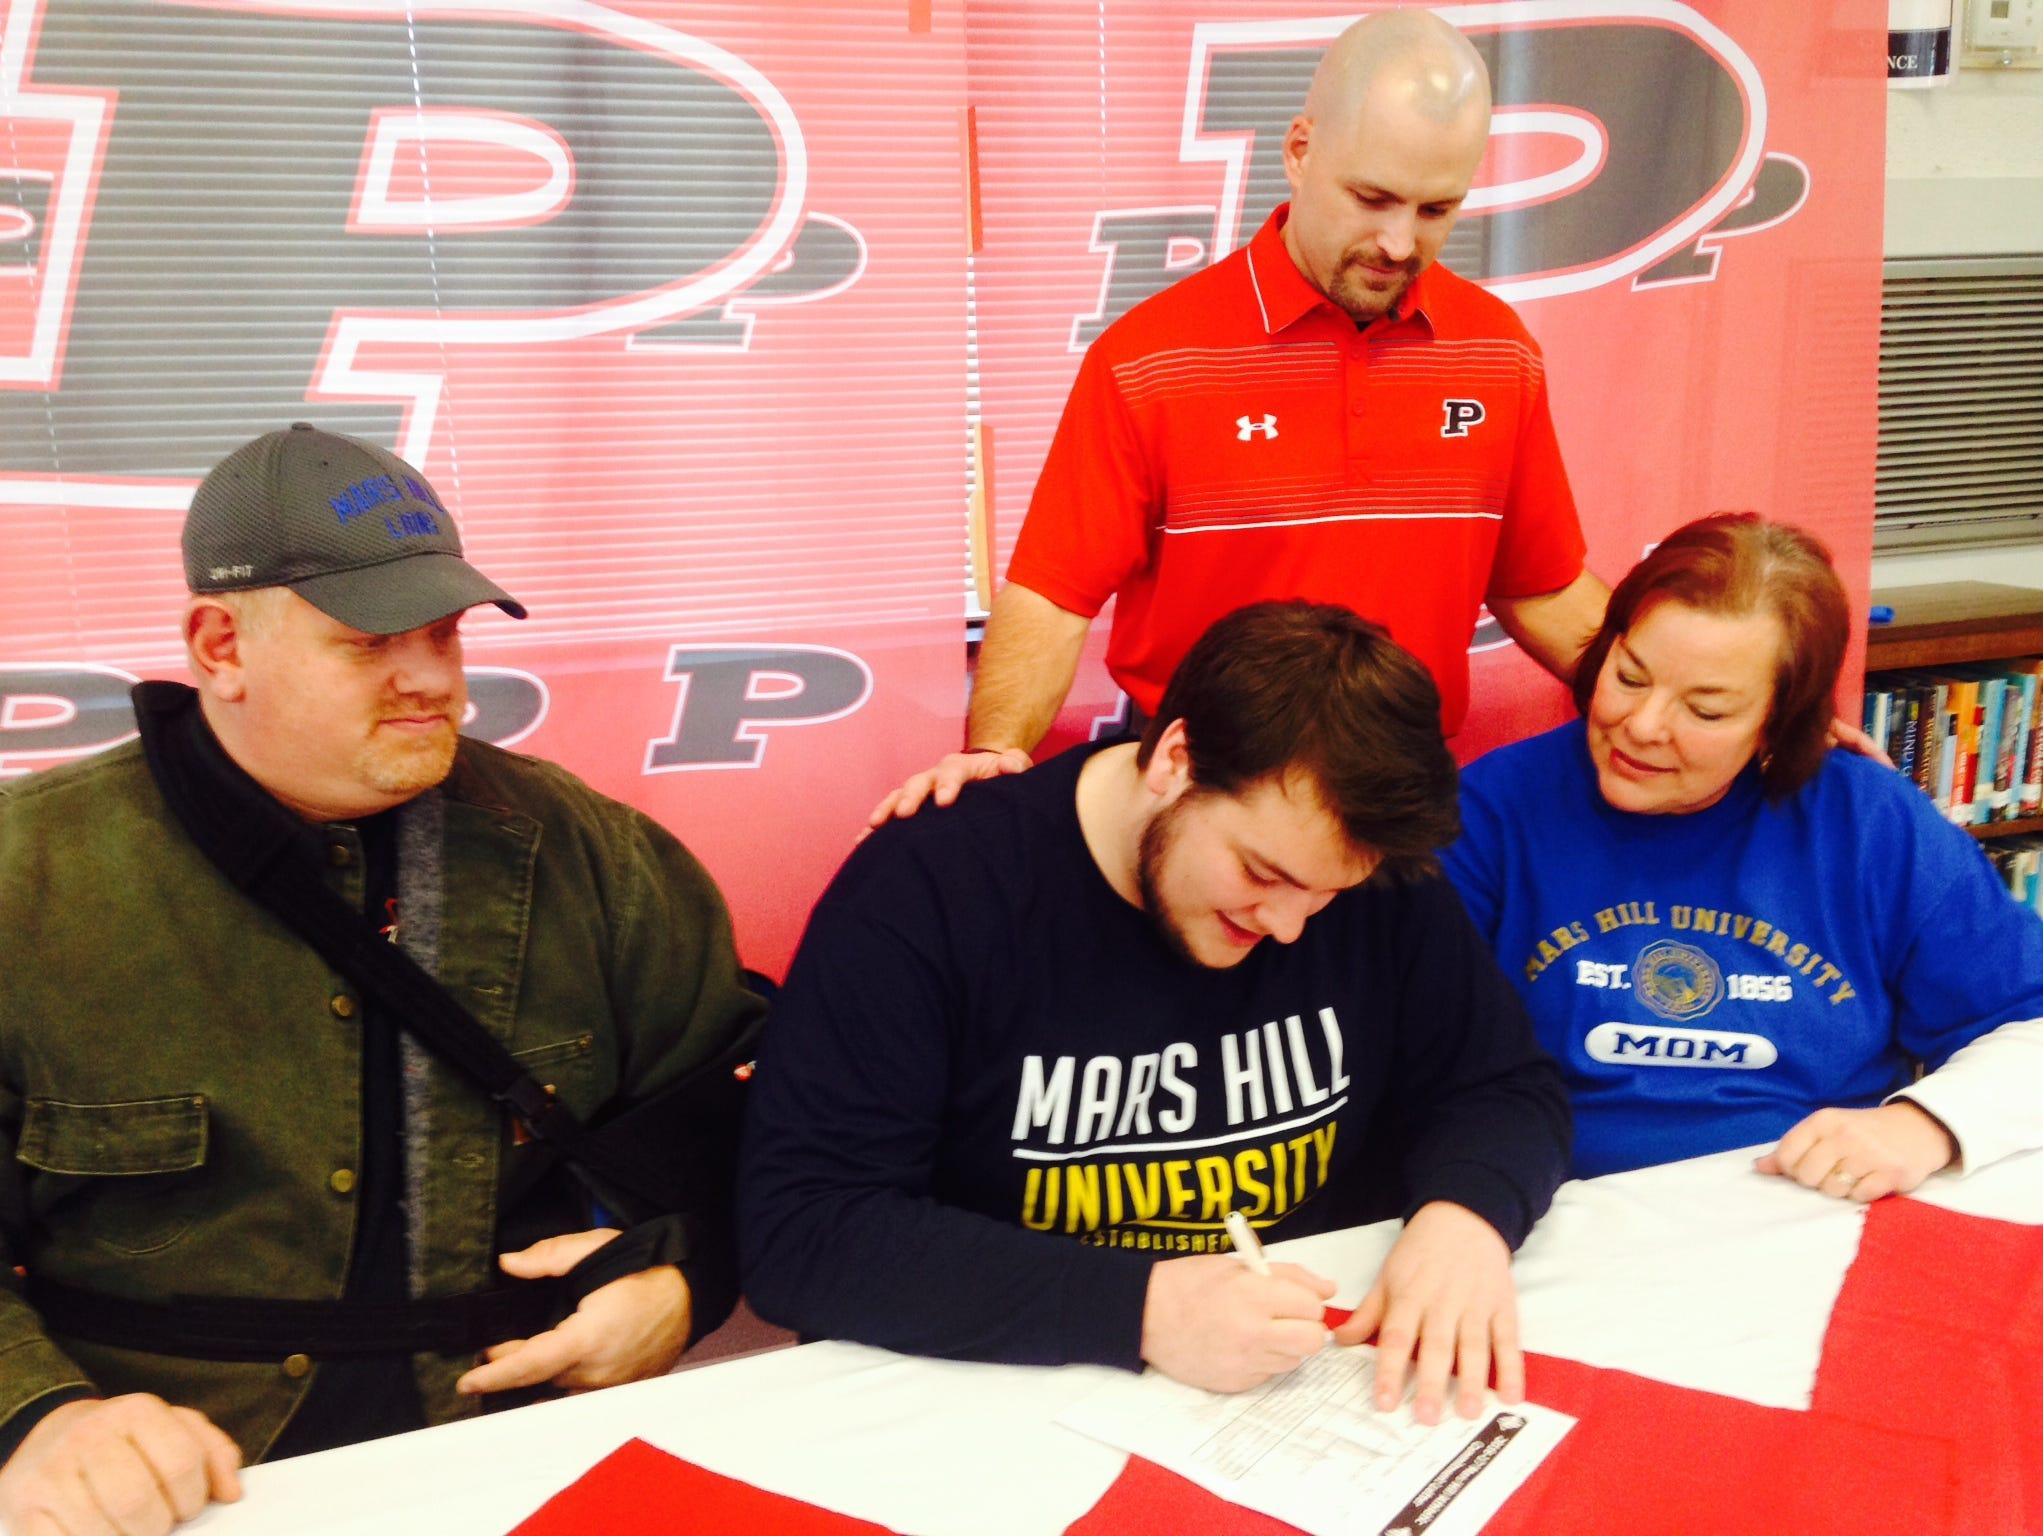 Pisgah senior David Mackey has signed to play college football for Mars Hill.